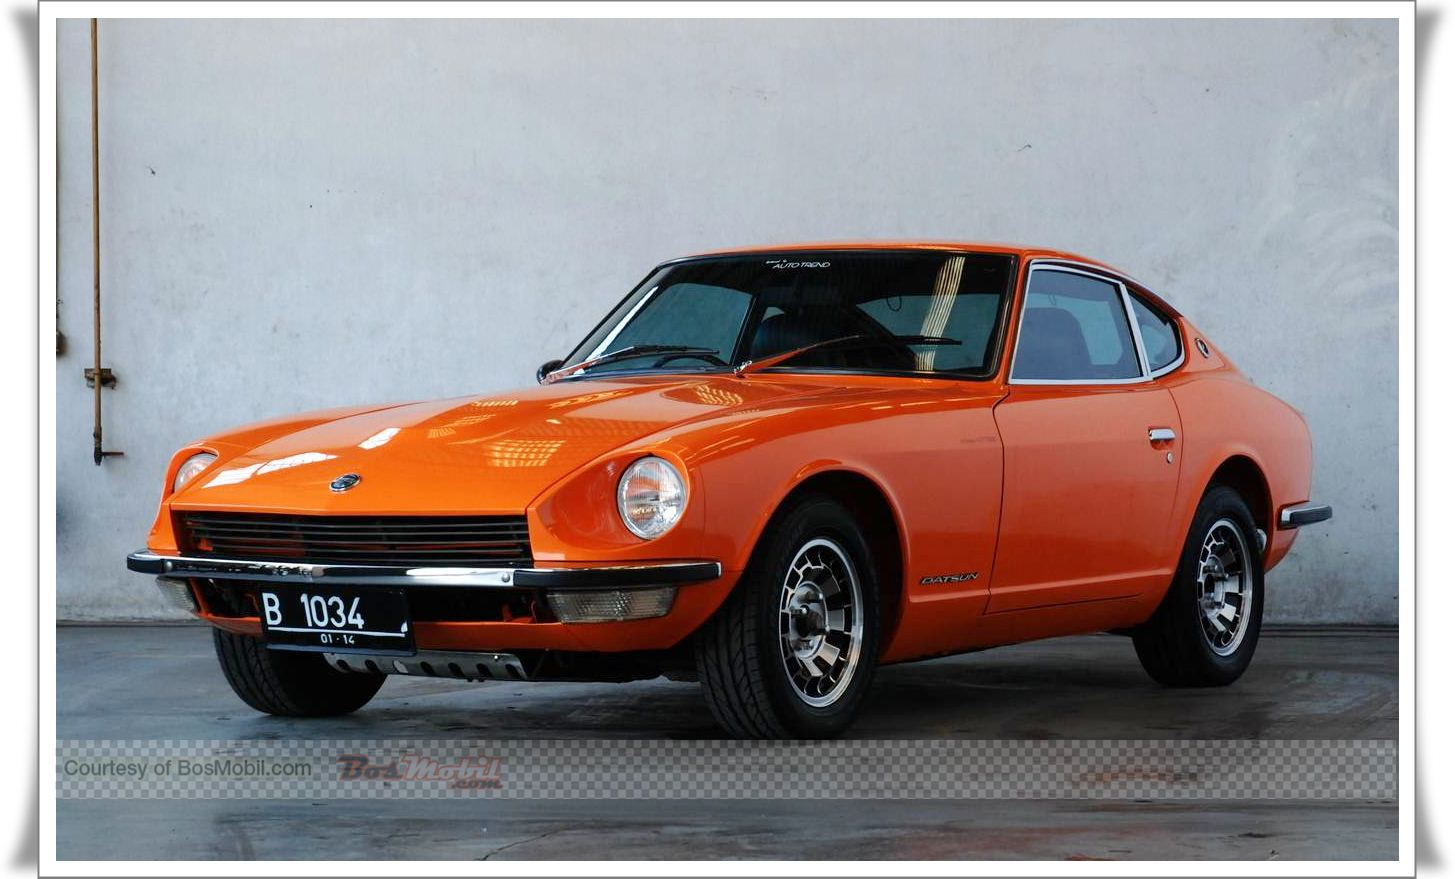 Modifikasi Mobil Tua Retro Klasik Legendaris  Mobil